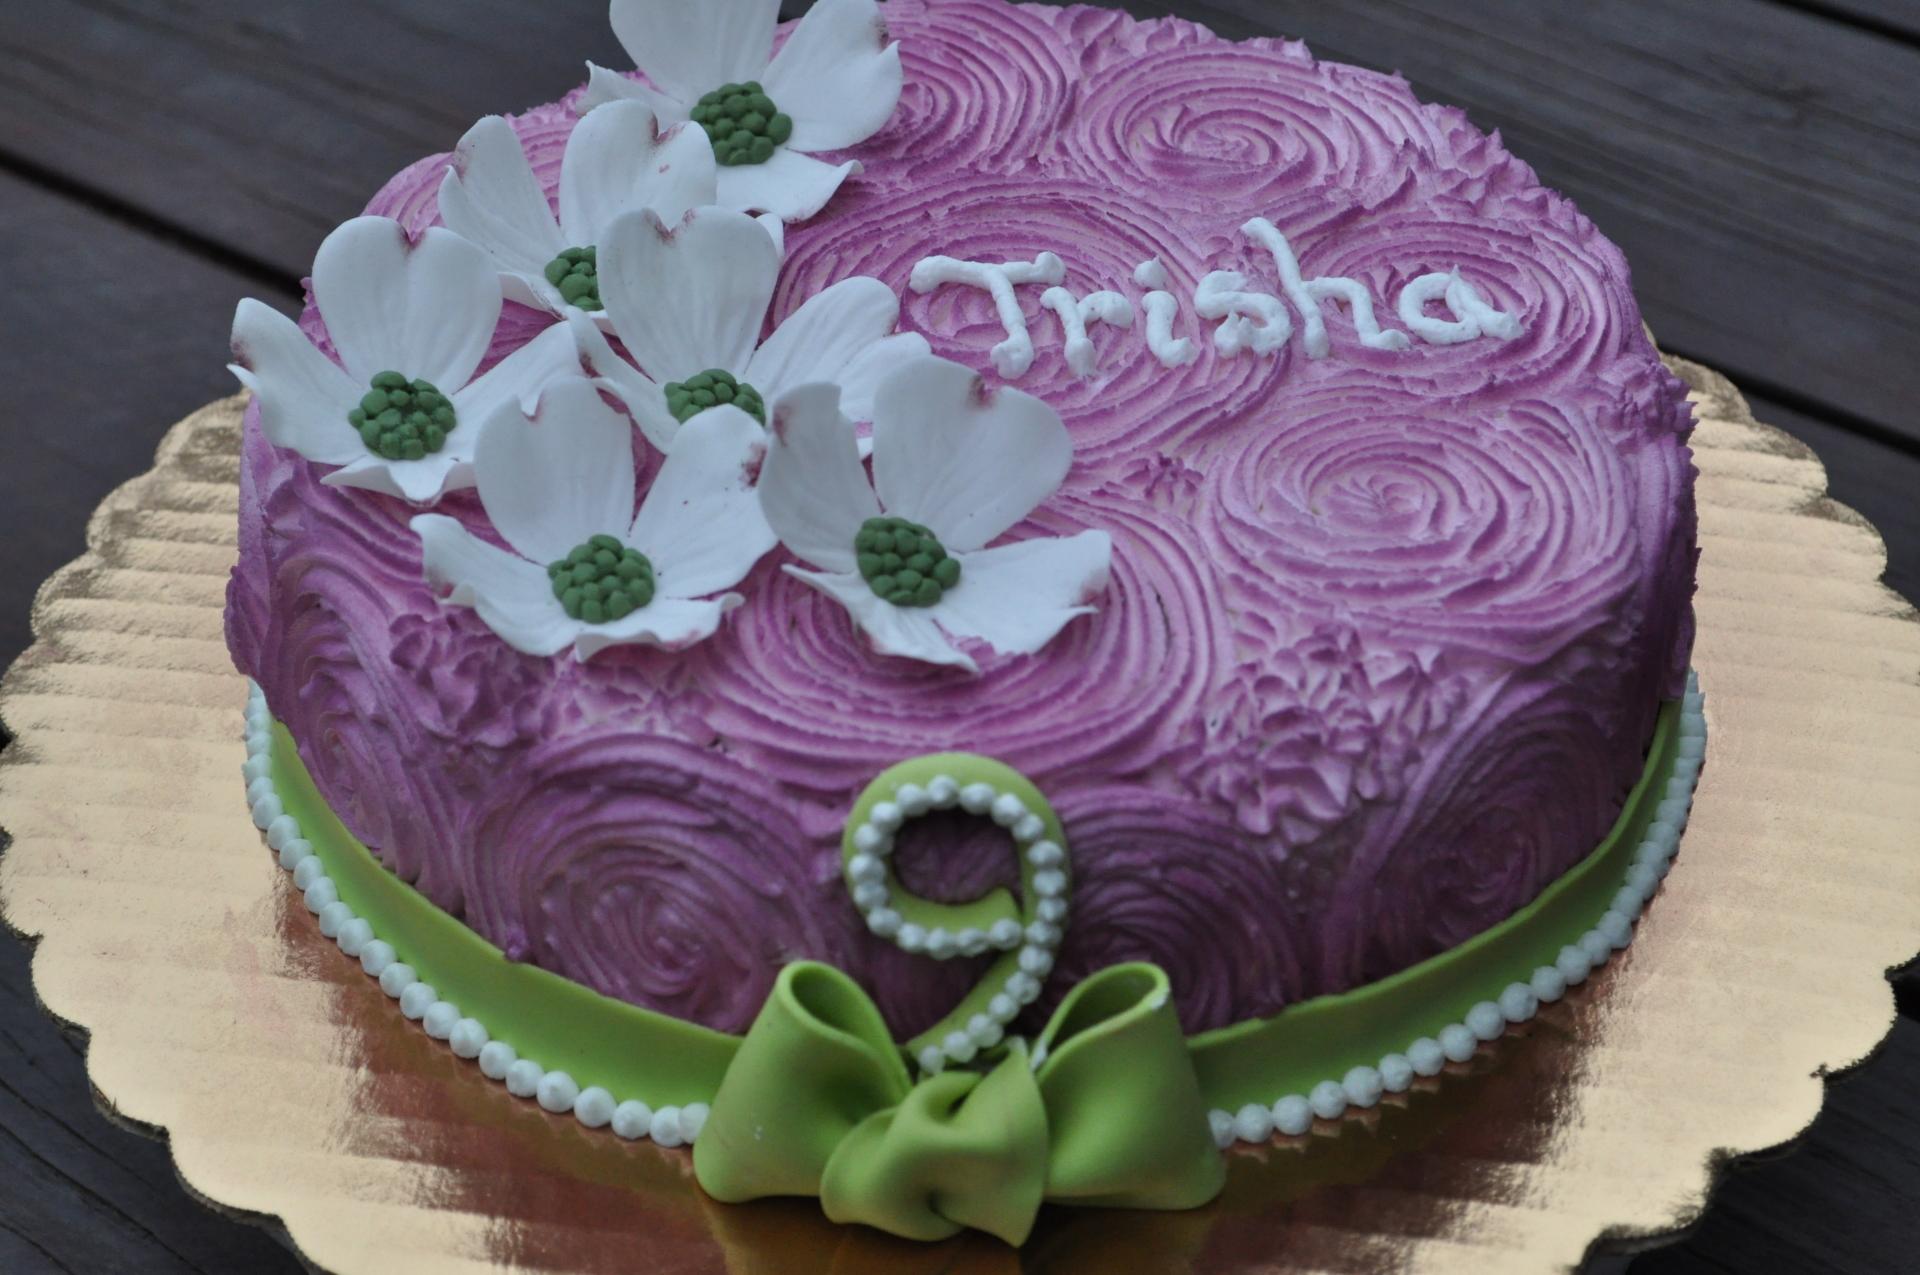 Rosettes cake, dogwood flower birthday cake